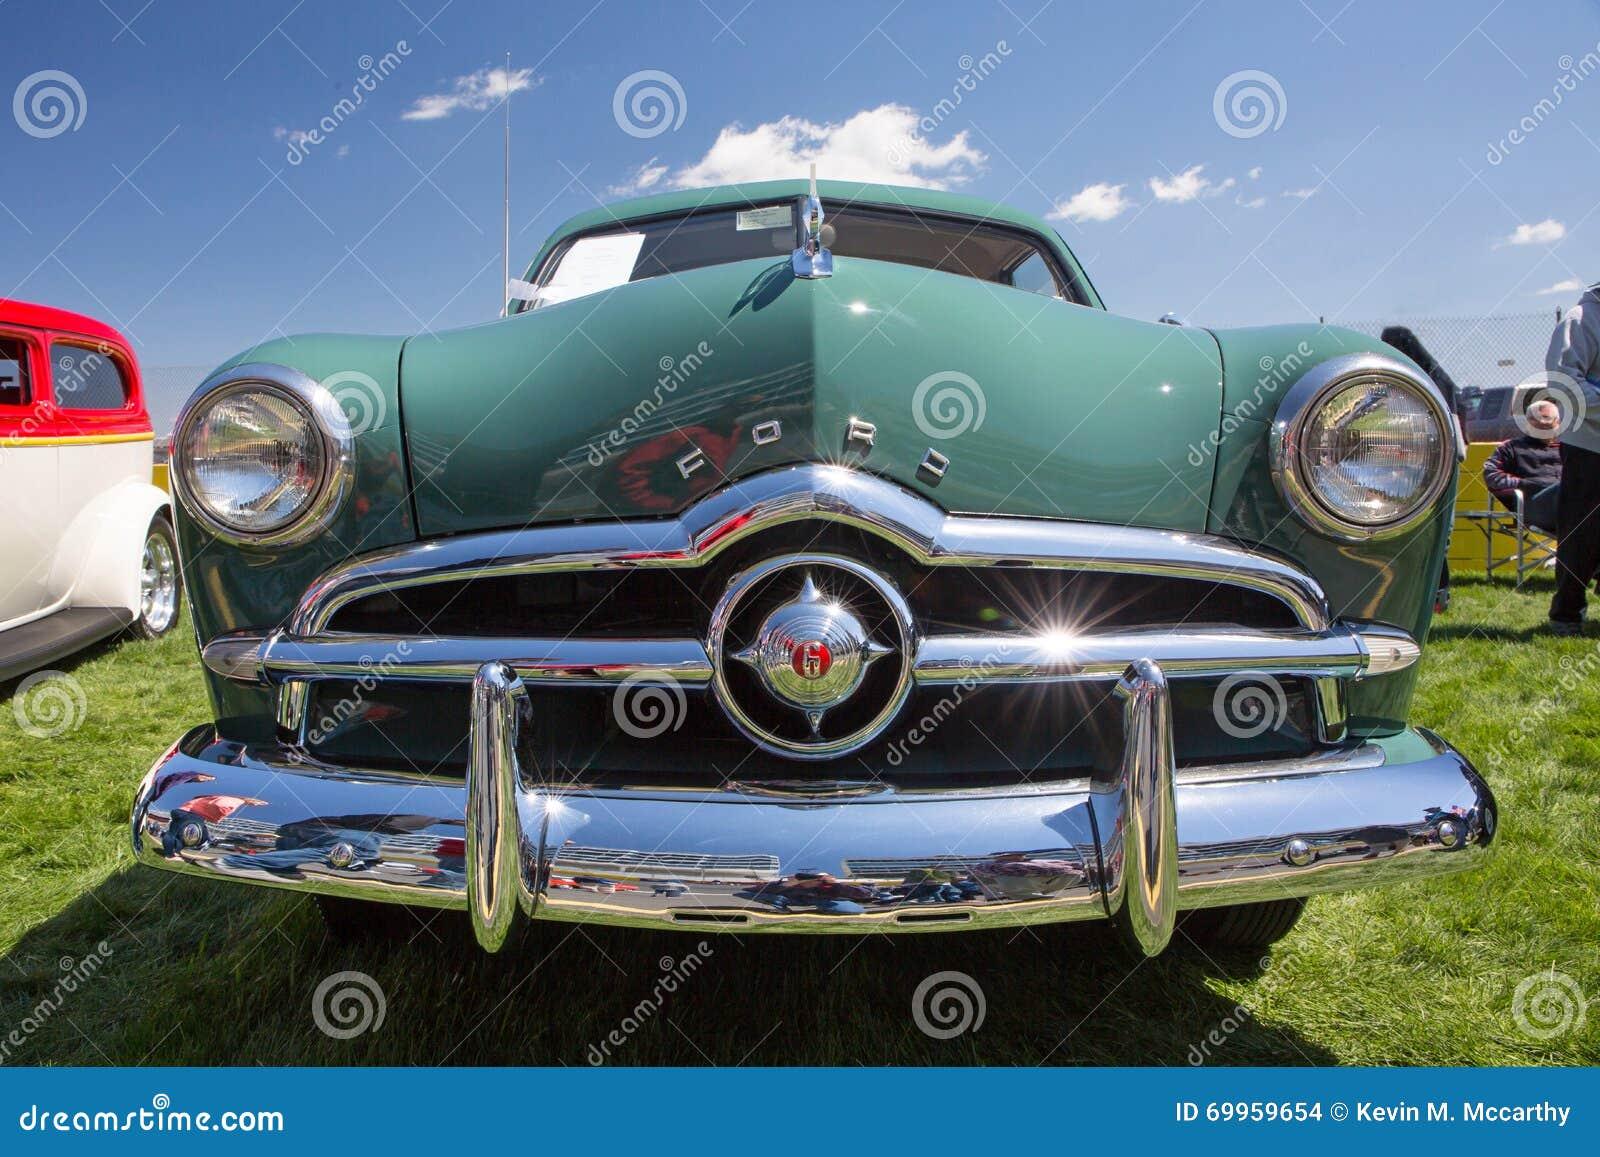 Volkswagen Concord Nc >> Auto Fair Ford | Upcomingcarshq.com